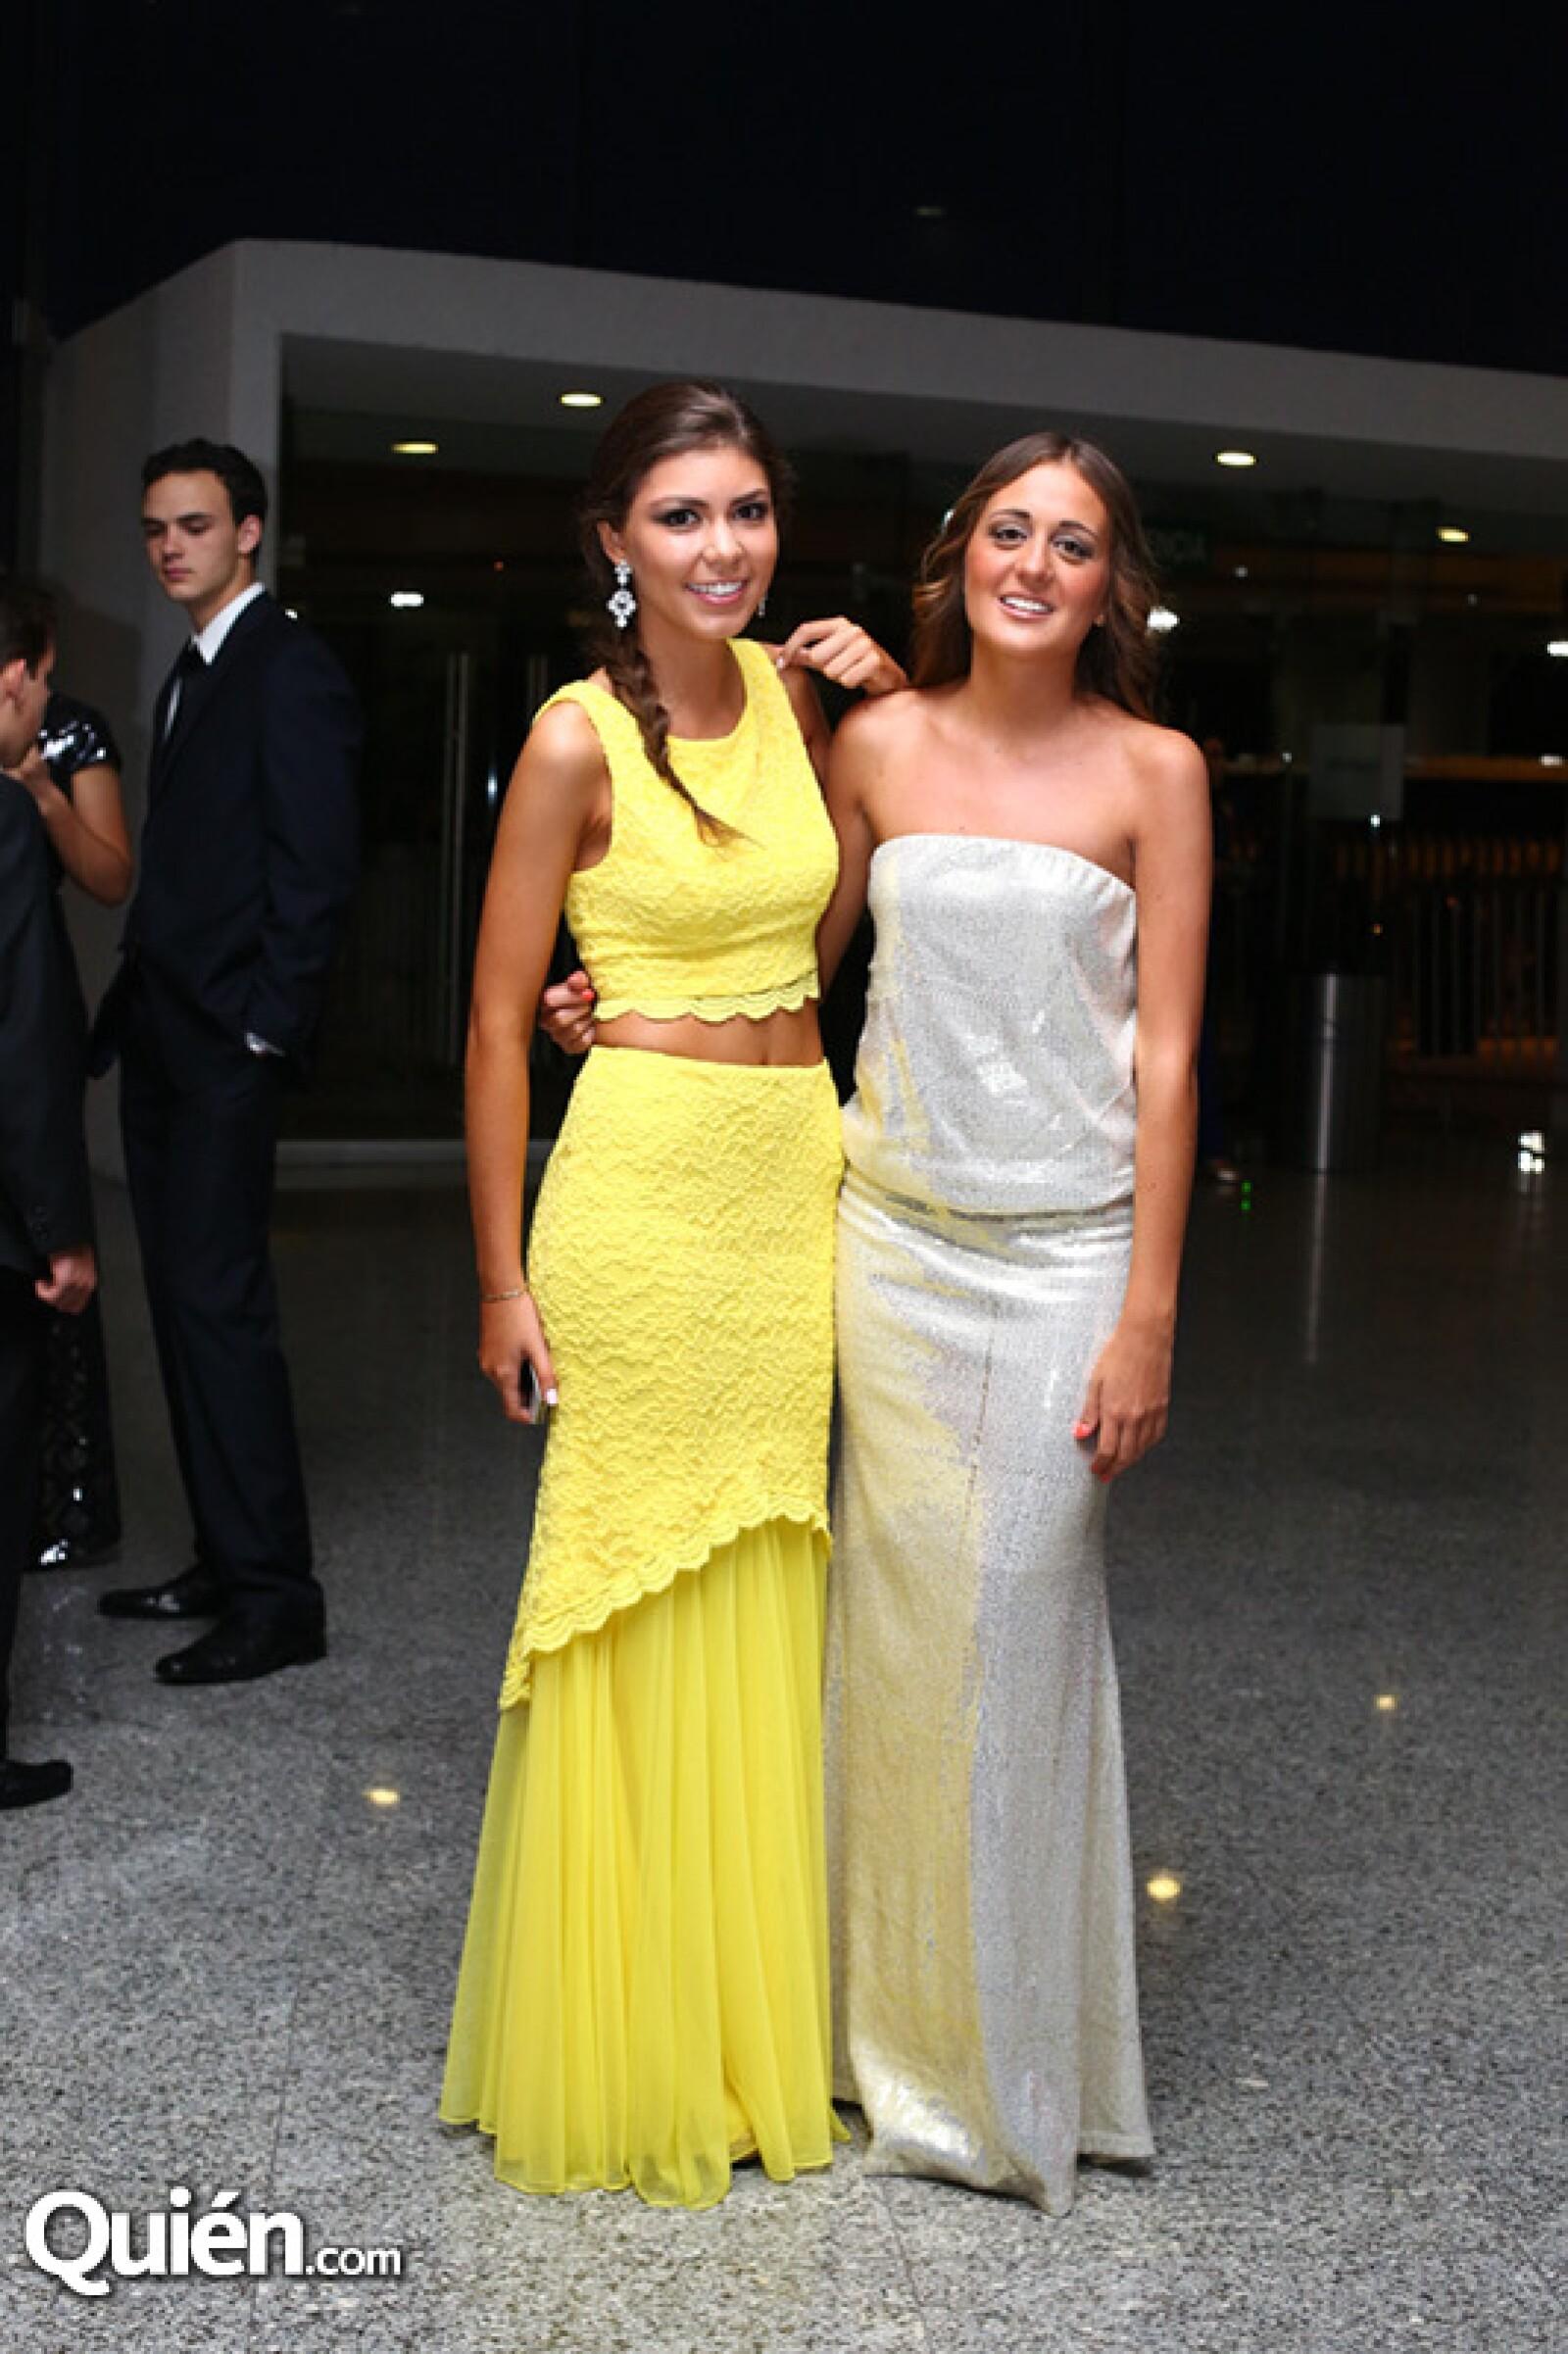 Mercedes Quintanal y Ana Rullan